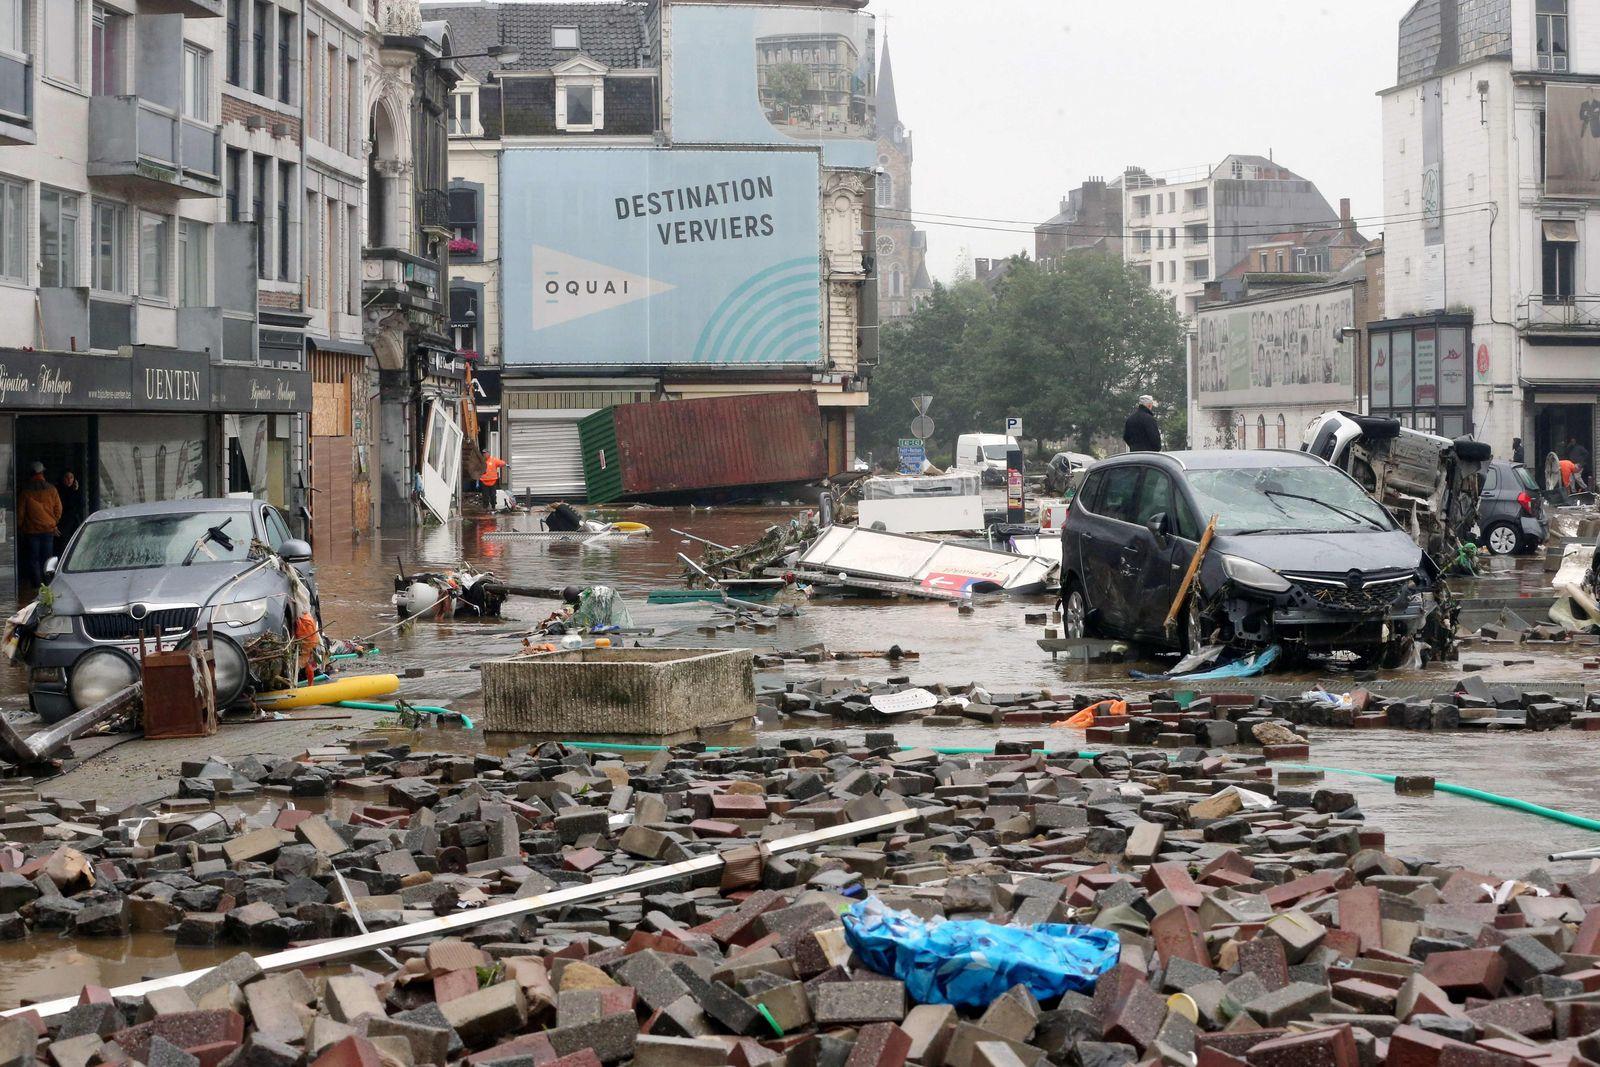 BELGIUM-WEATHER-FLOODS